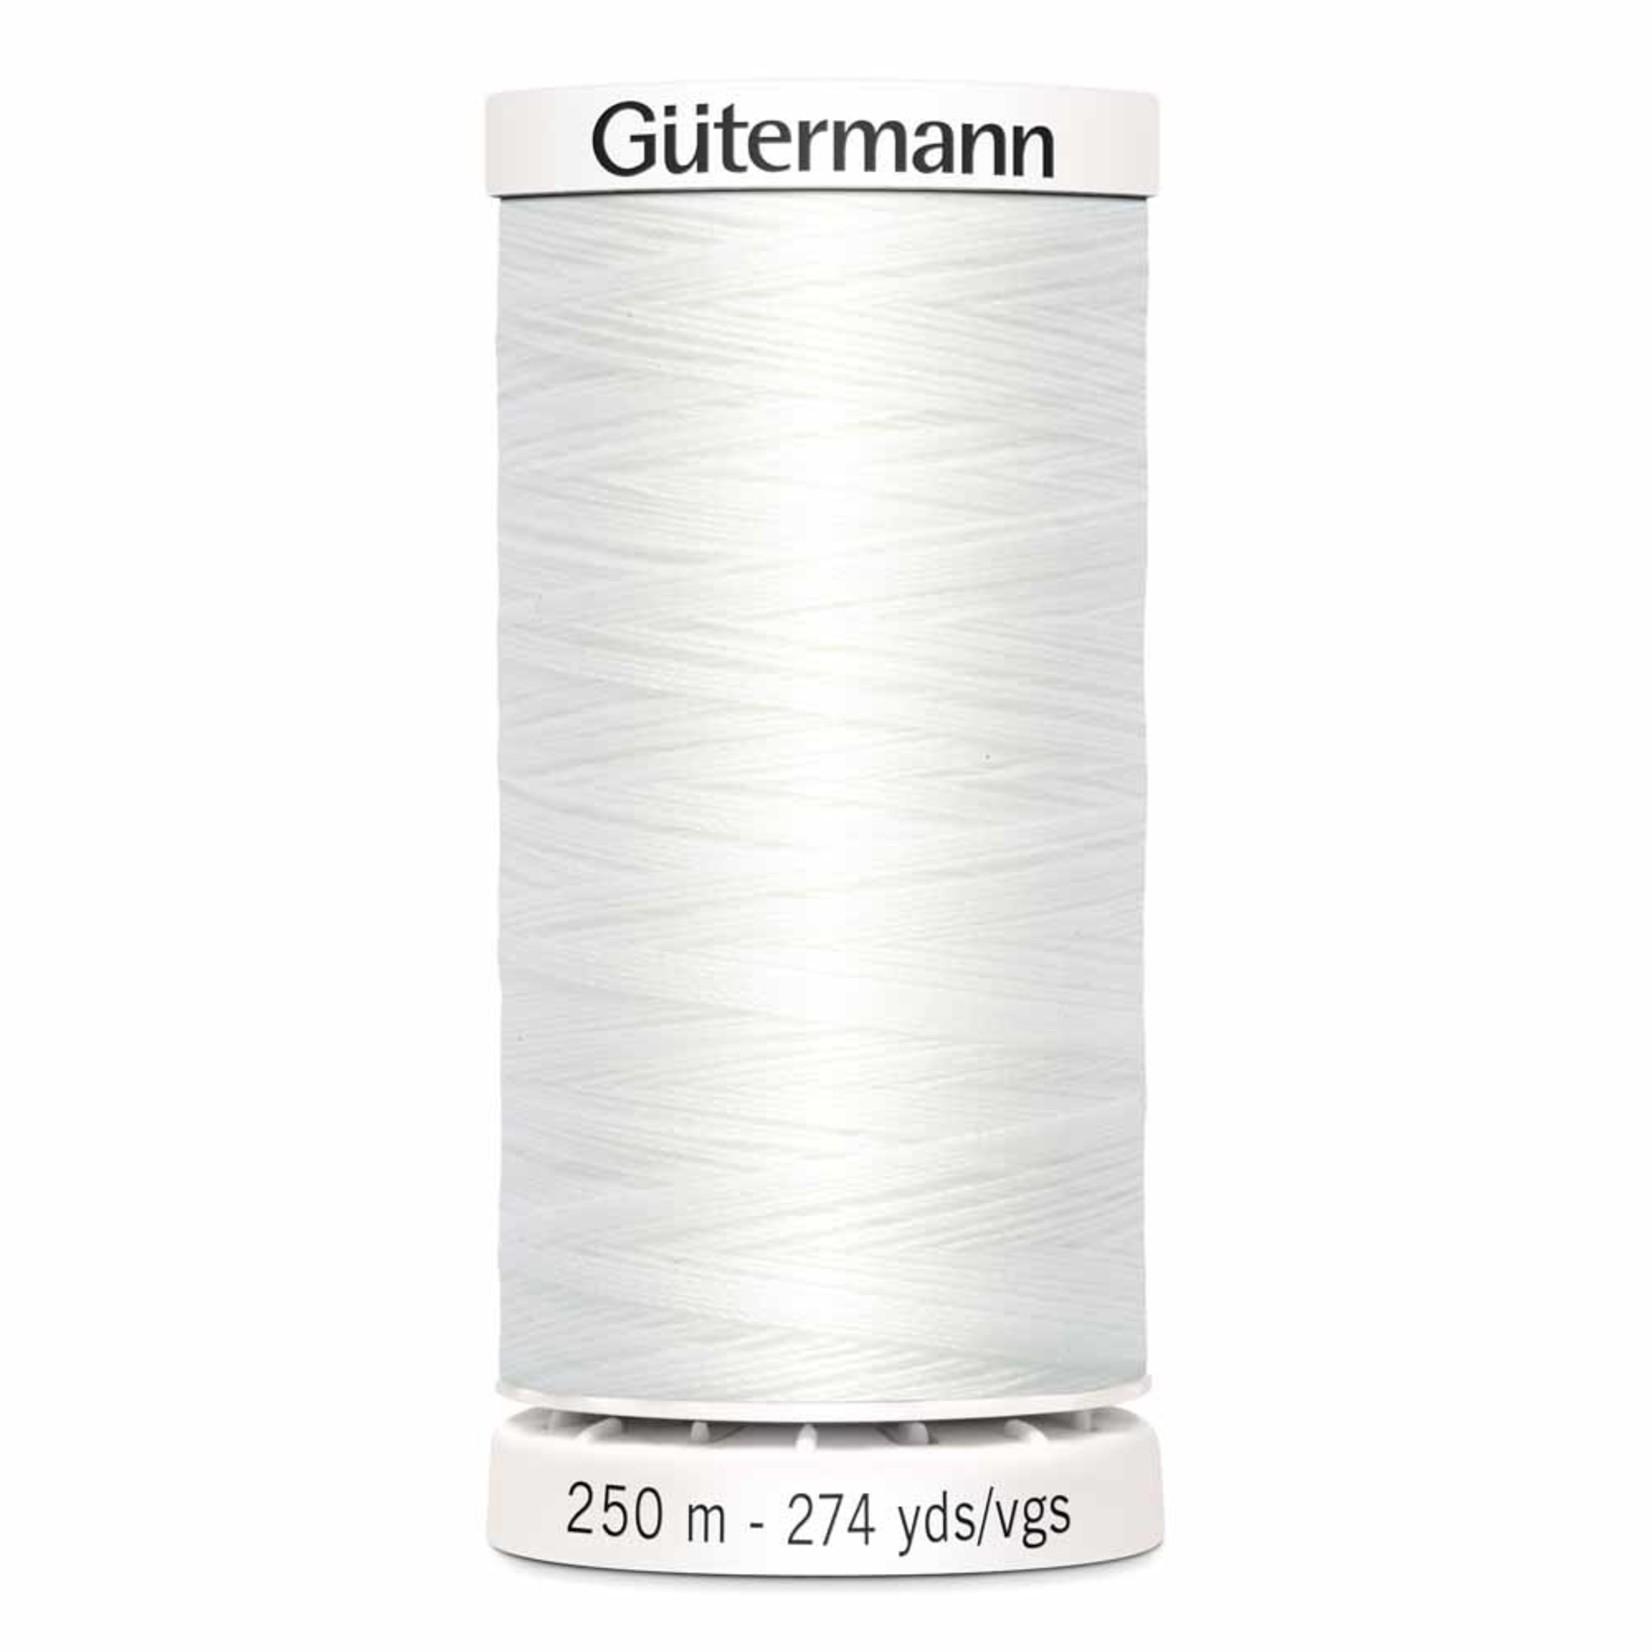 Gutermann Gutermann Bobbin - MCT Polyester Sew-All